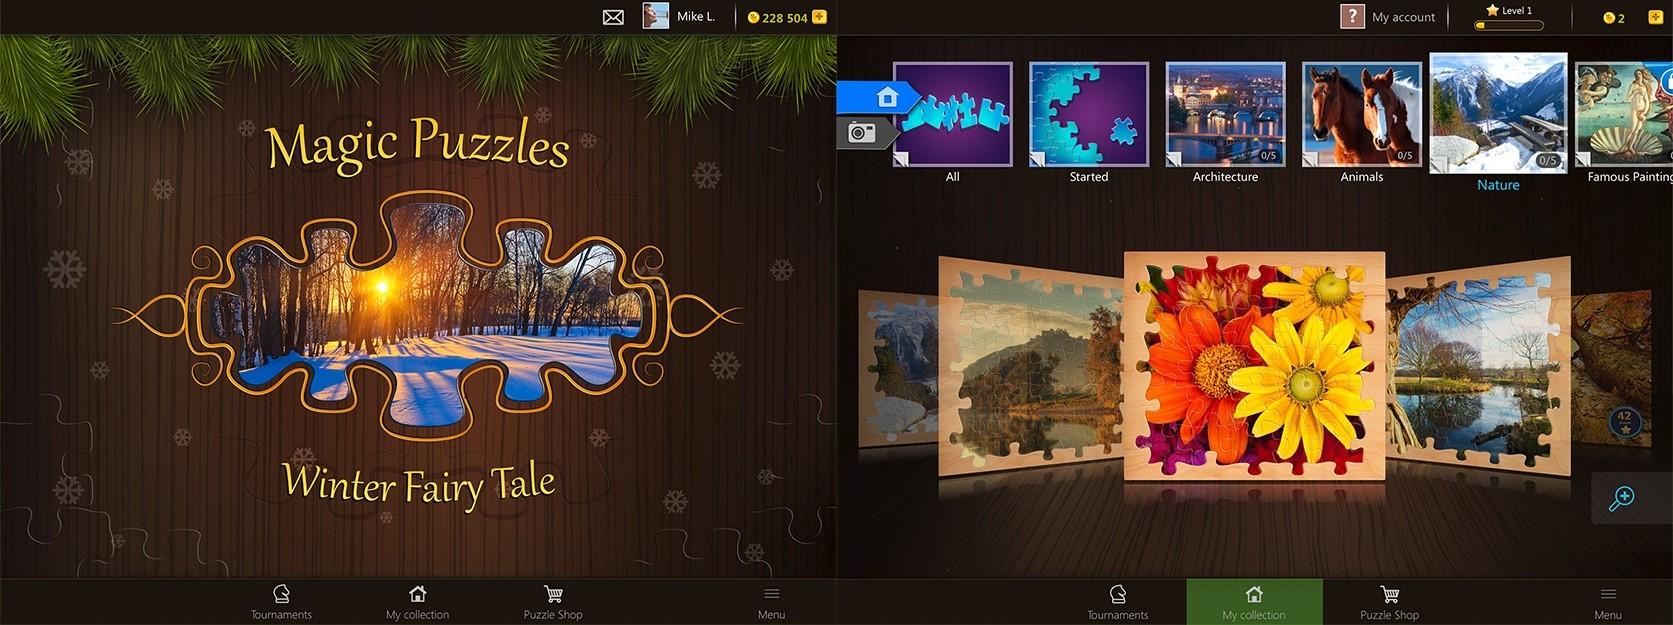 RU_wooden_design_magic_jigsaw_puzzles